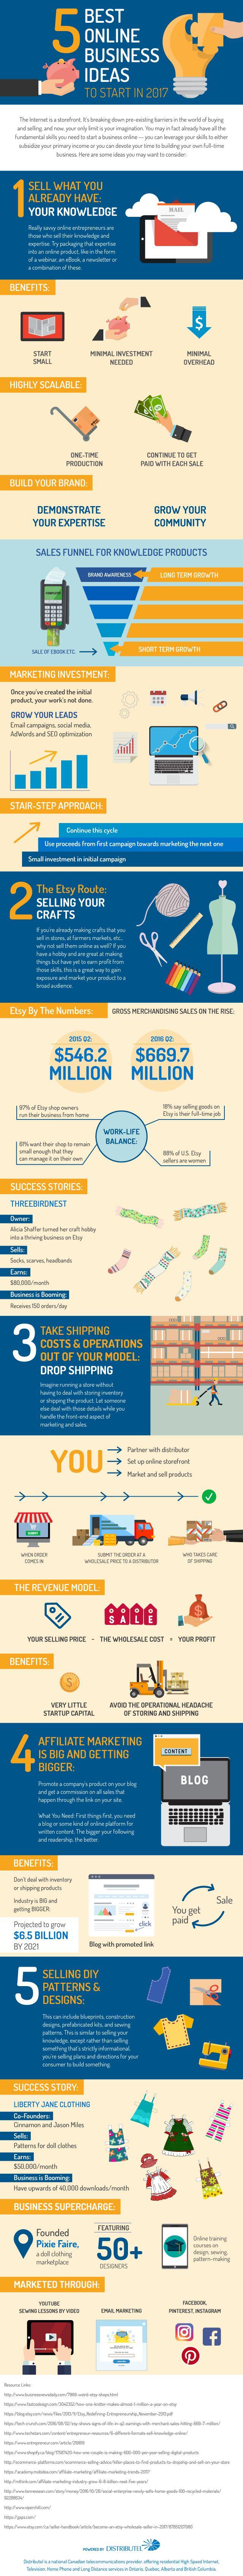 5 Best Online Business Ideas